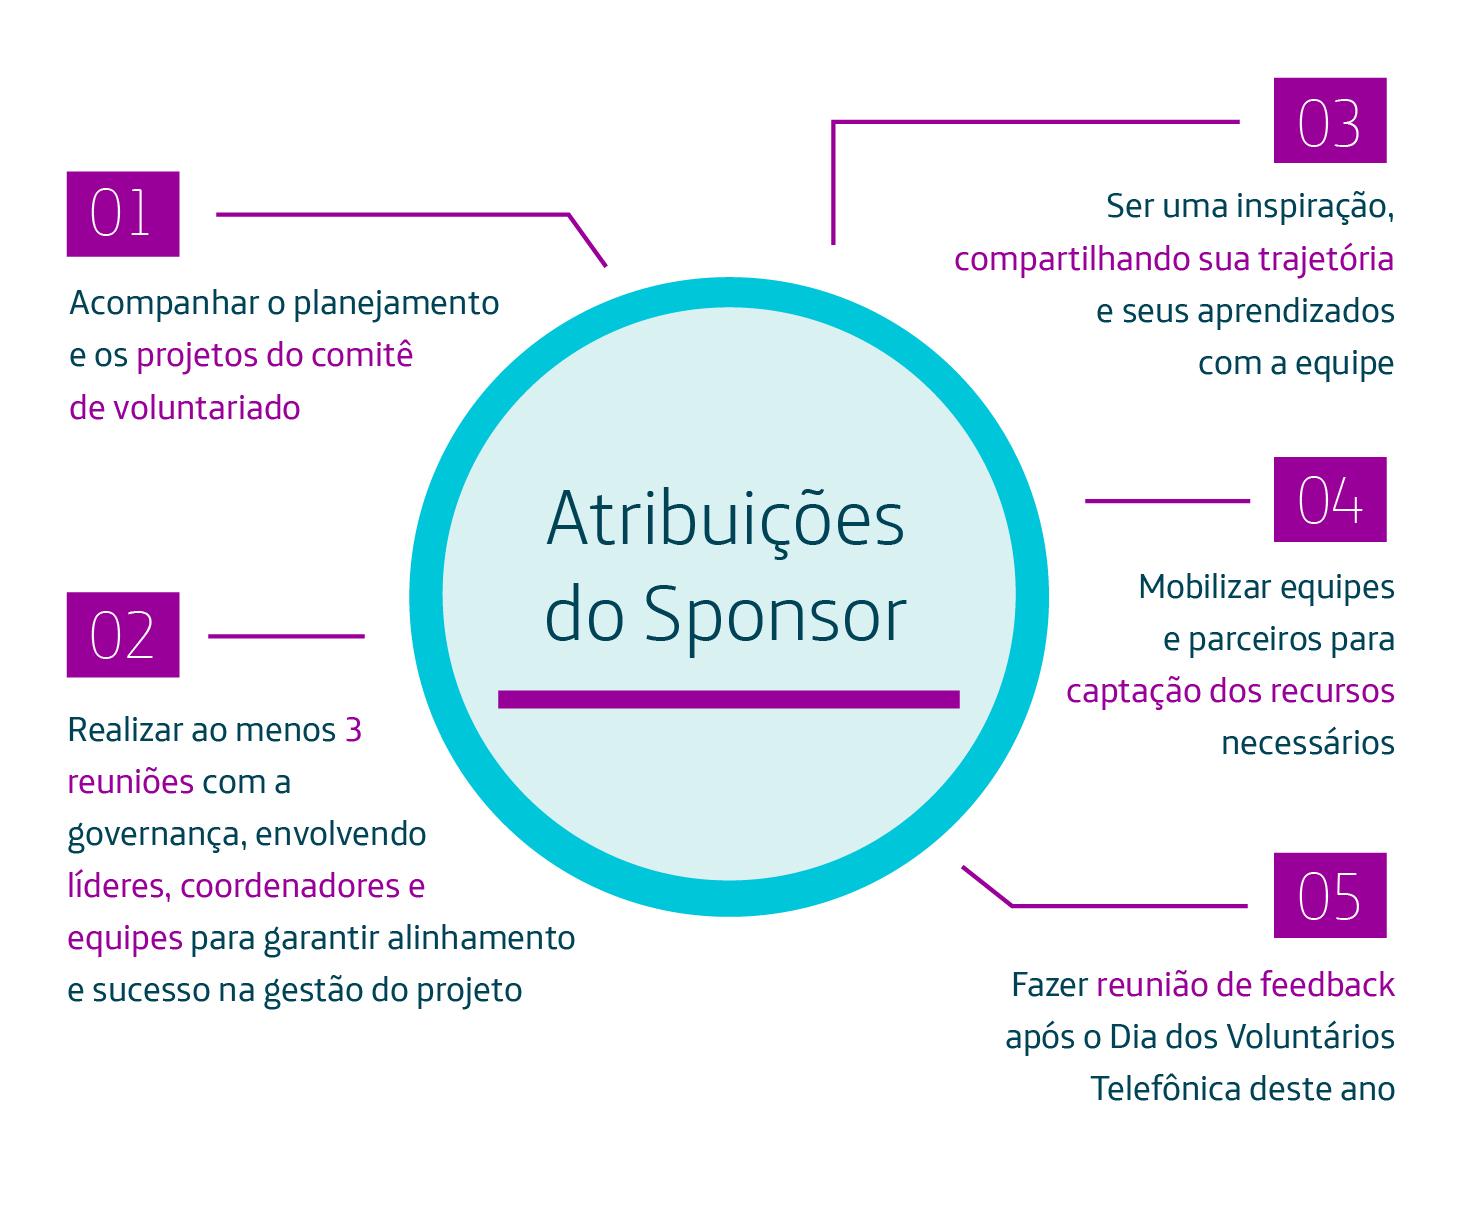 info_governanca_atribuicoesdosponsor